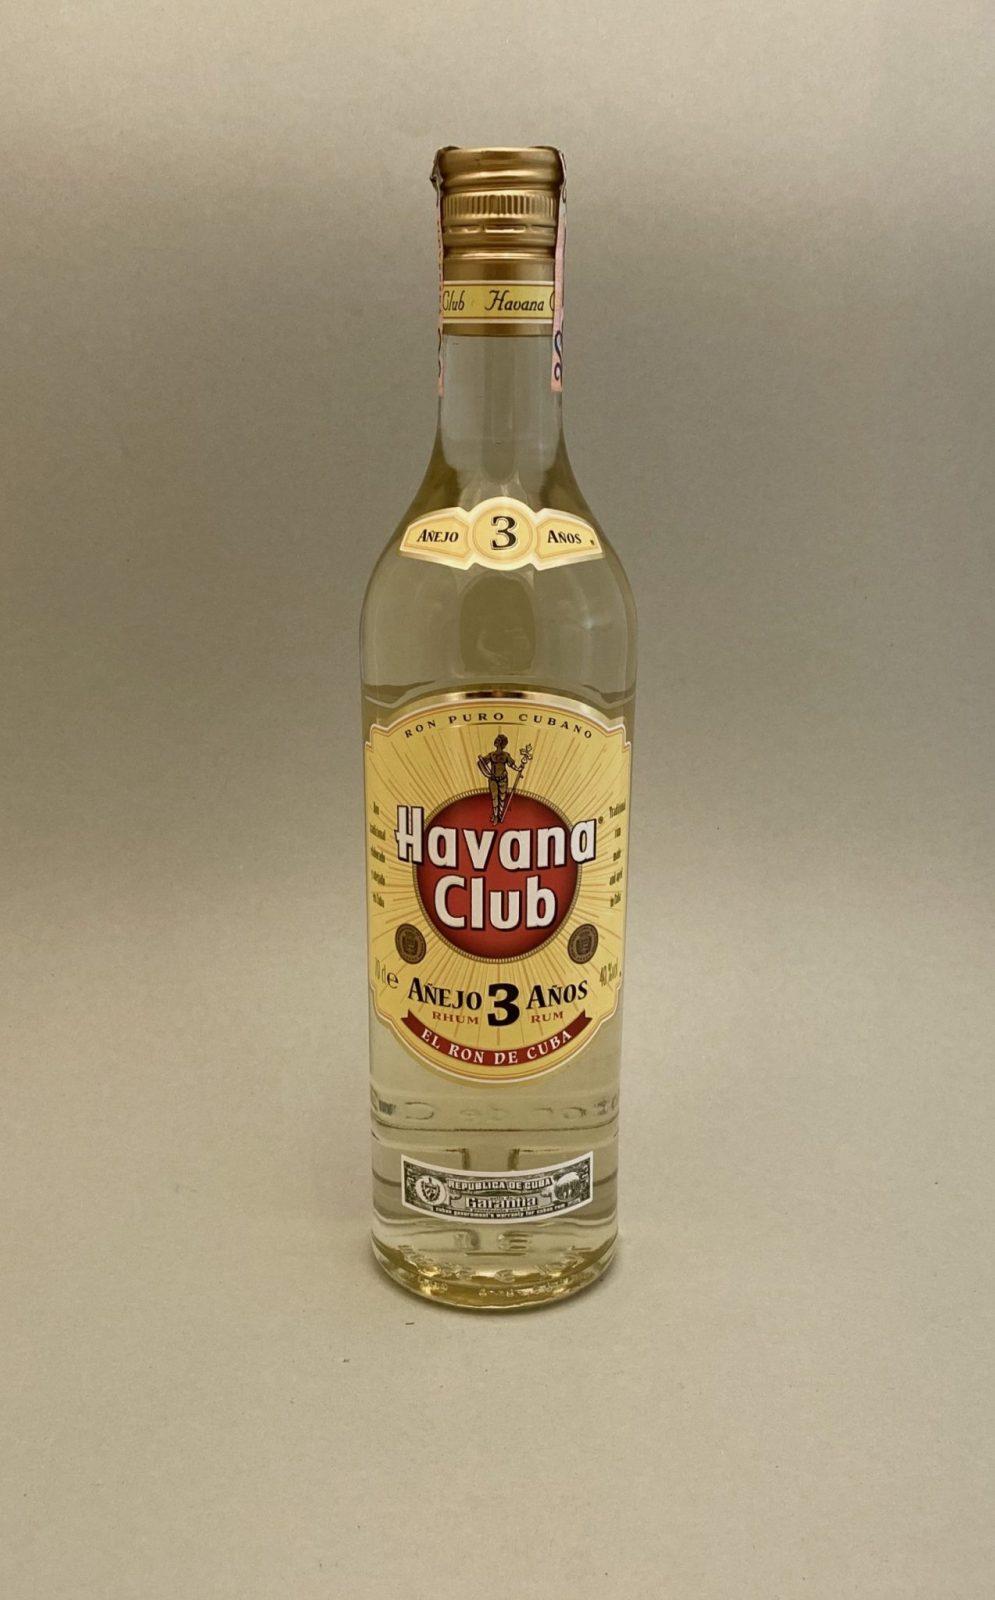 Havana Club 3YO 40%, Bottleshop Sunny wines slnecnice mesto, petrzalka, rum, rozvoz alkoholu, eshop